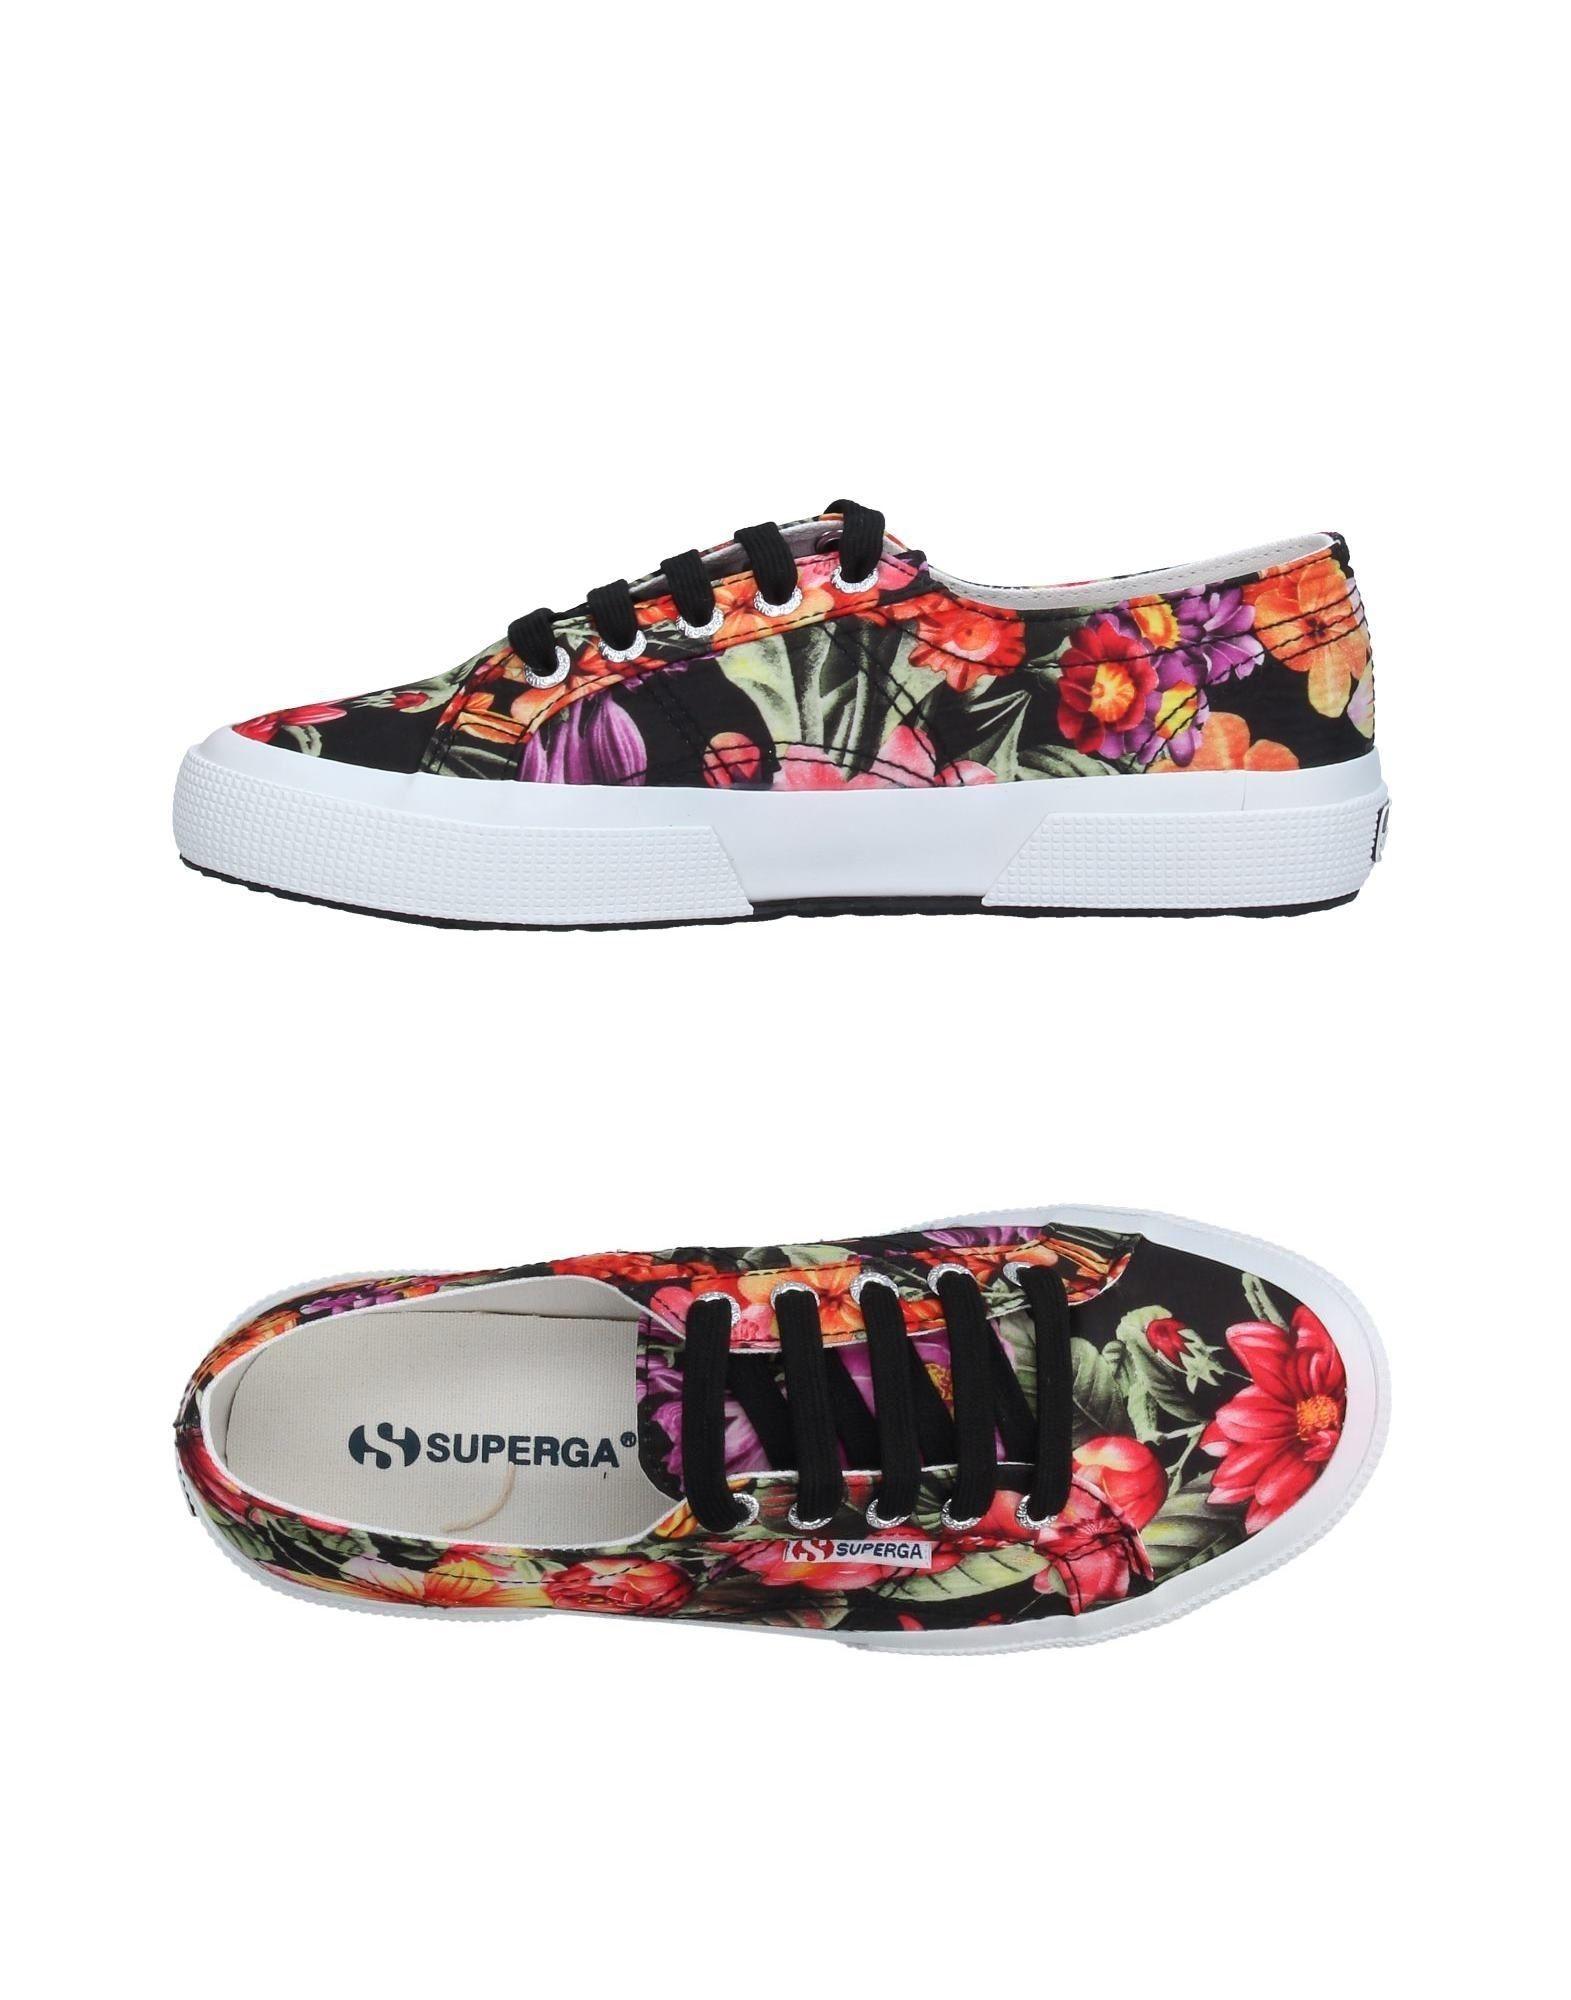 Sneakers Superga® Femme - Sneakers Superga® sur